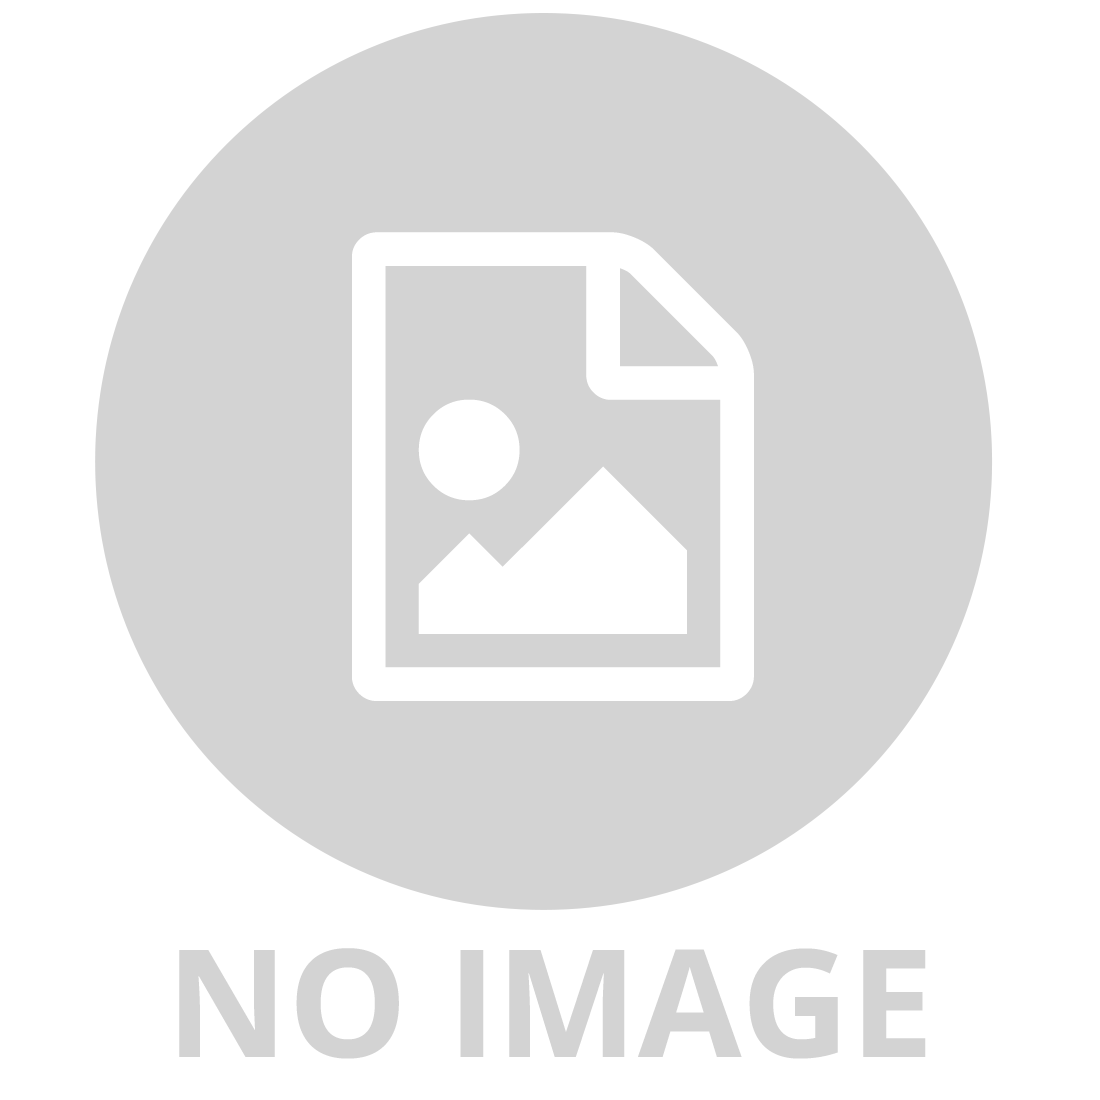 AIRFIX 1:72 STARTER SET HAWKER SIDDELEY HARRIER GR.1